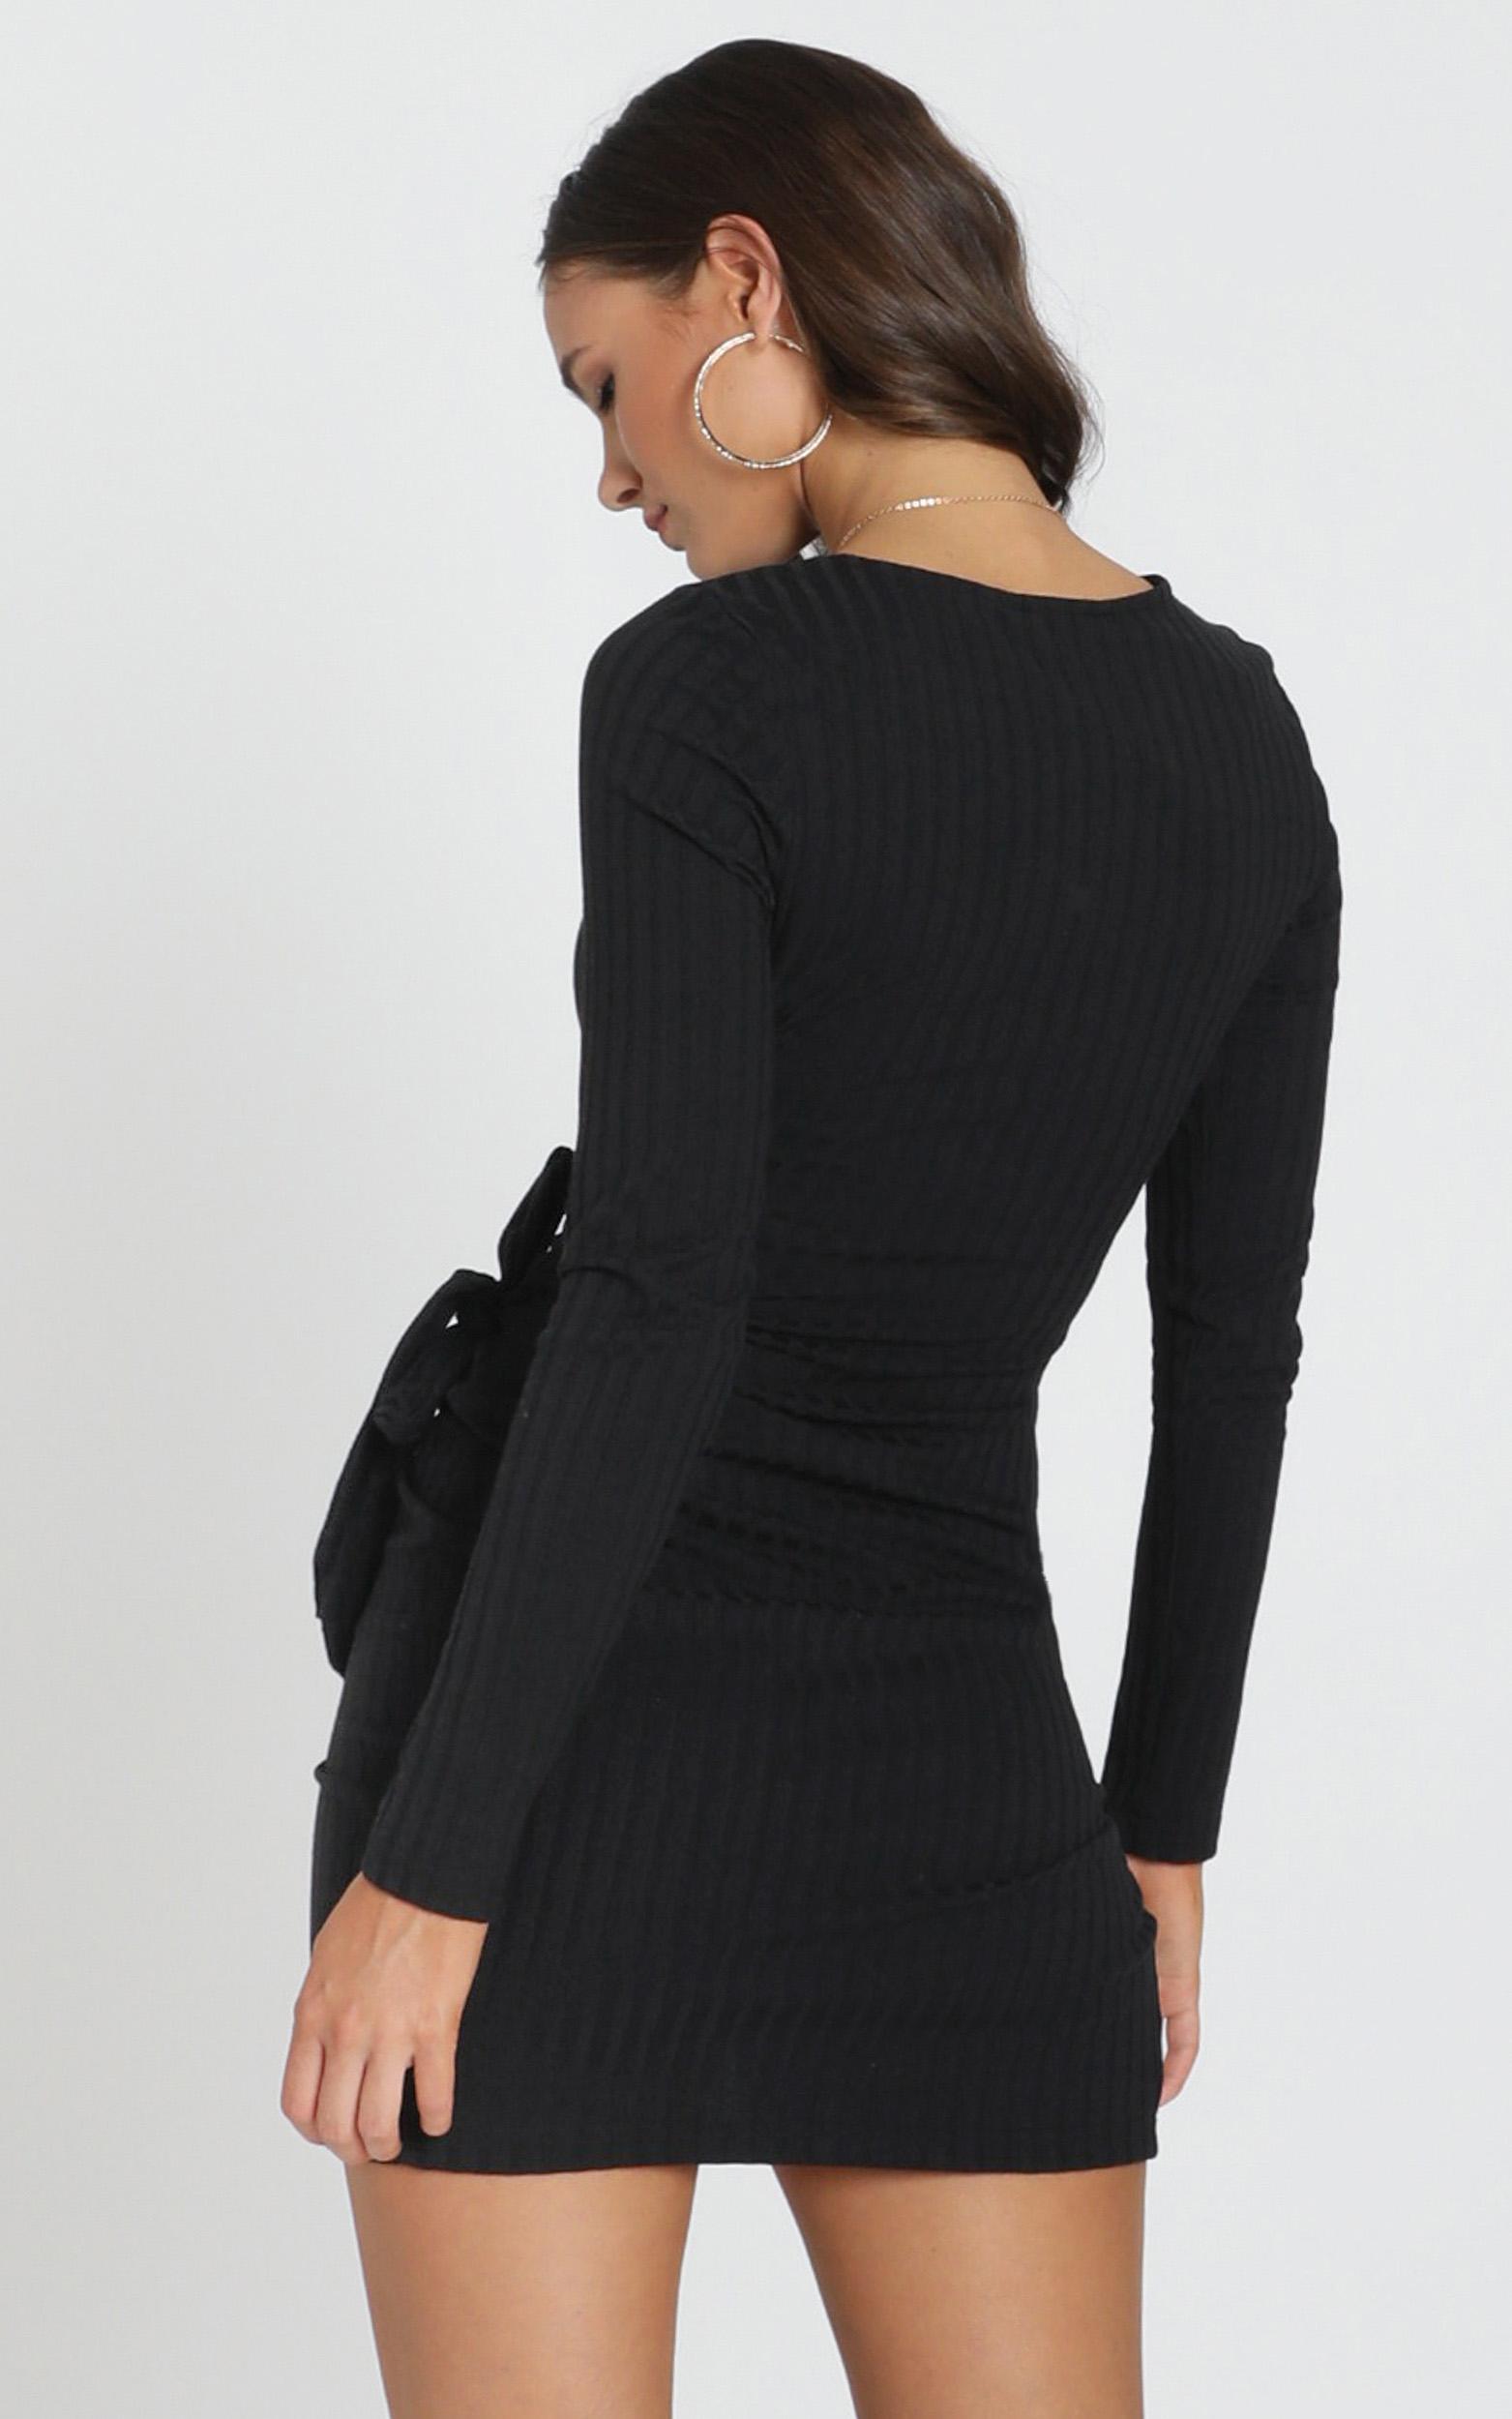 Treasure Trove Dress in black - 6 (XS), Black, hi-res image number null